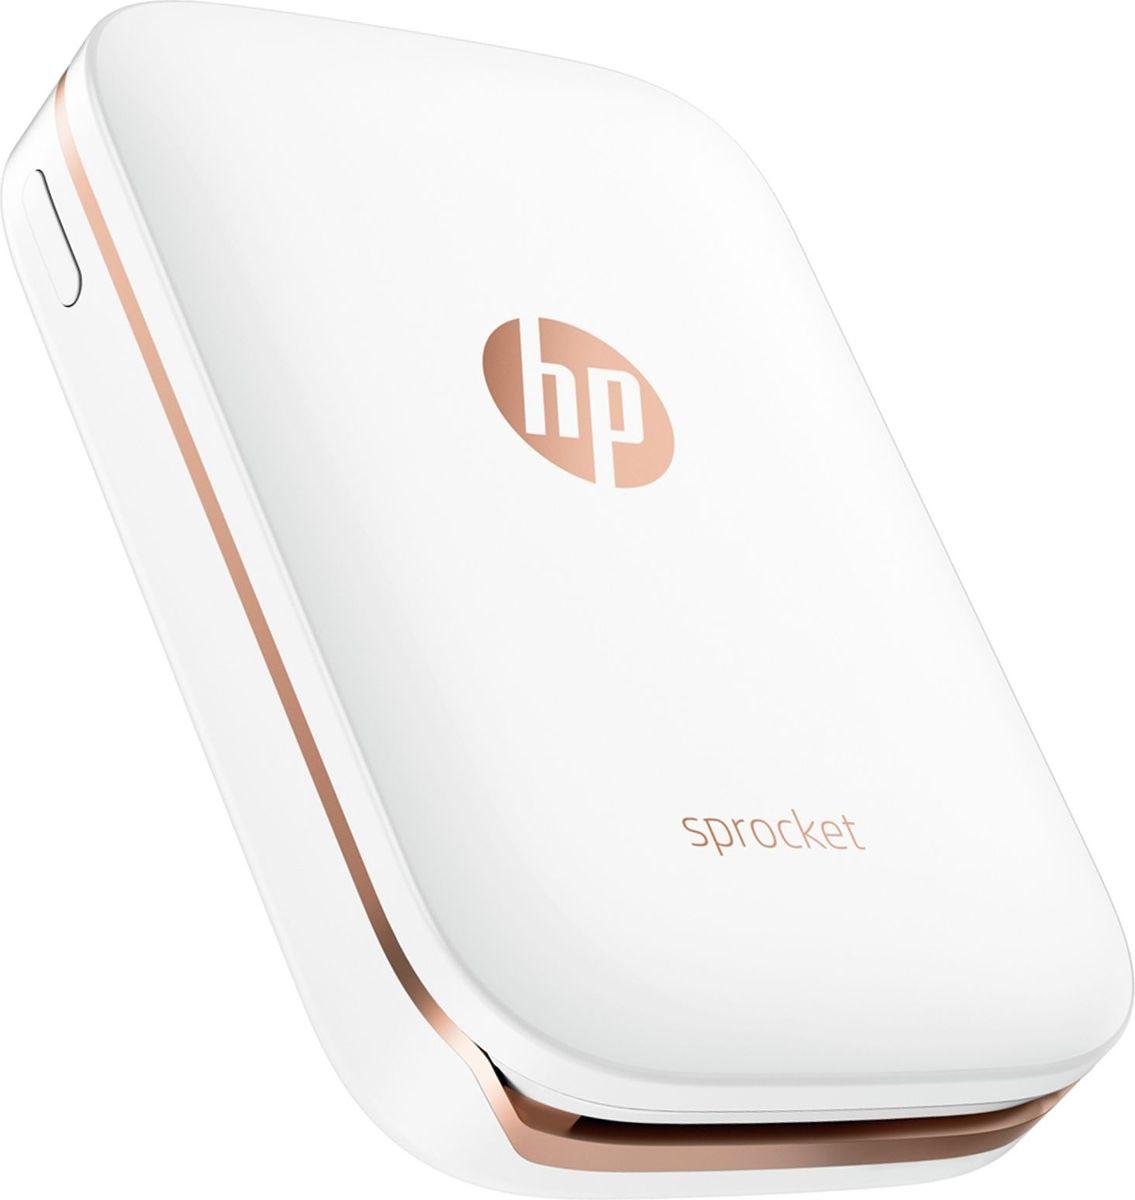 лучшая цена Принтер HP Sprocket, White